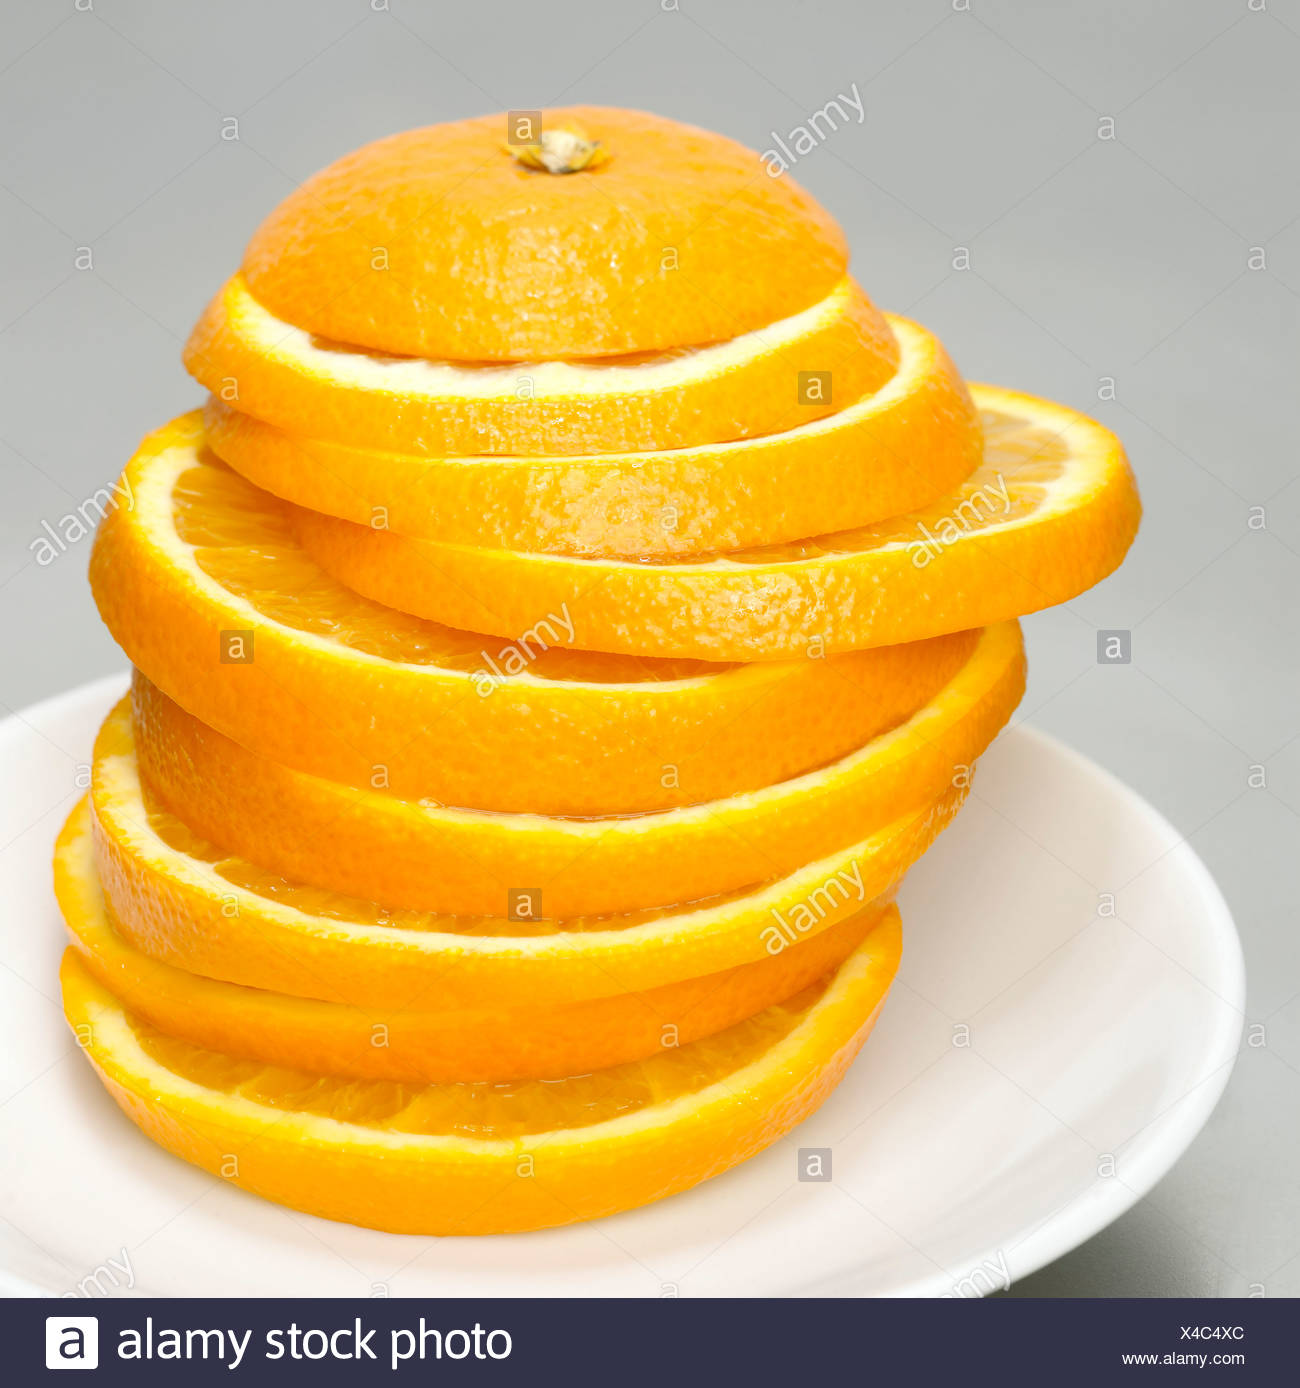 Stacked orange slices, close-up - Stock Image